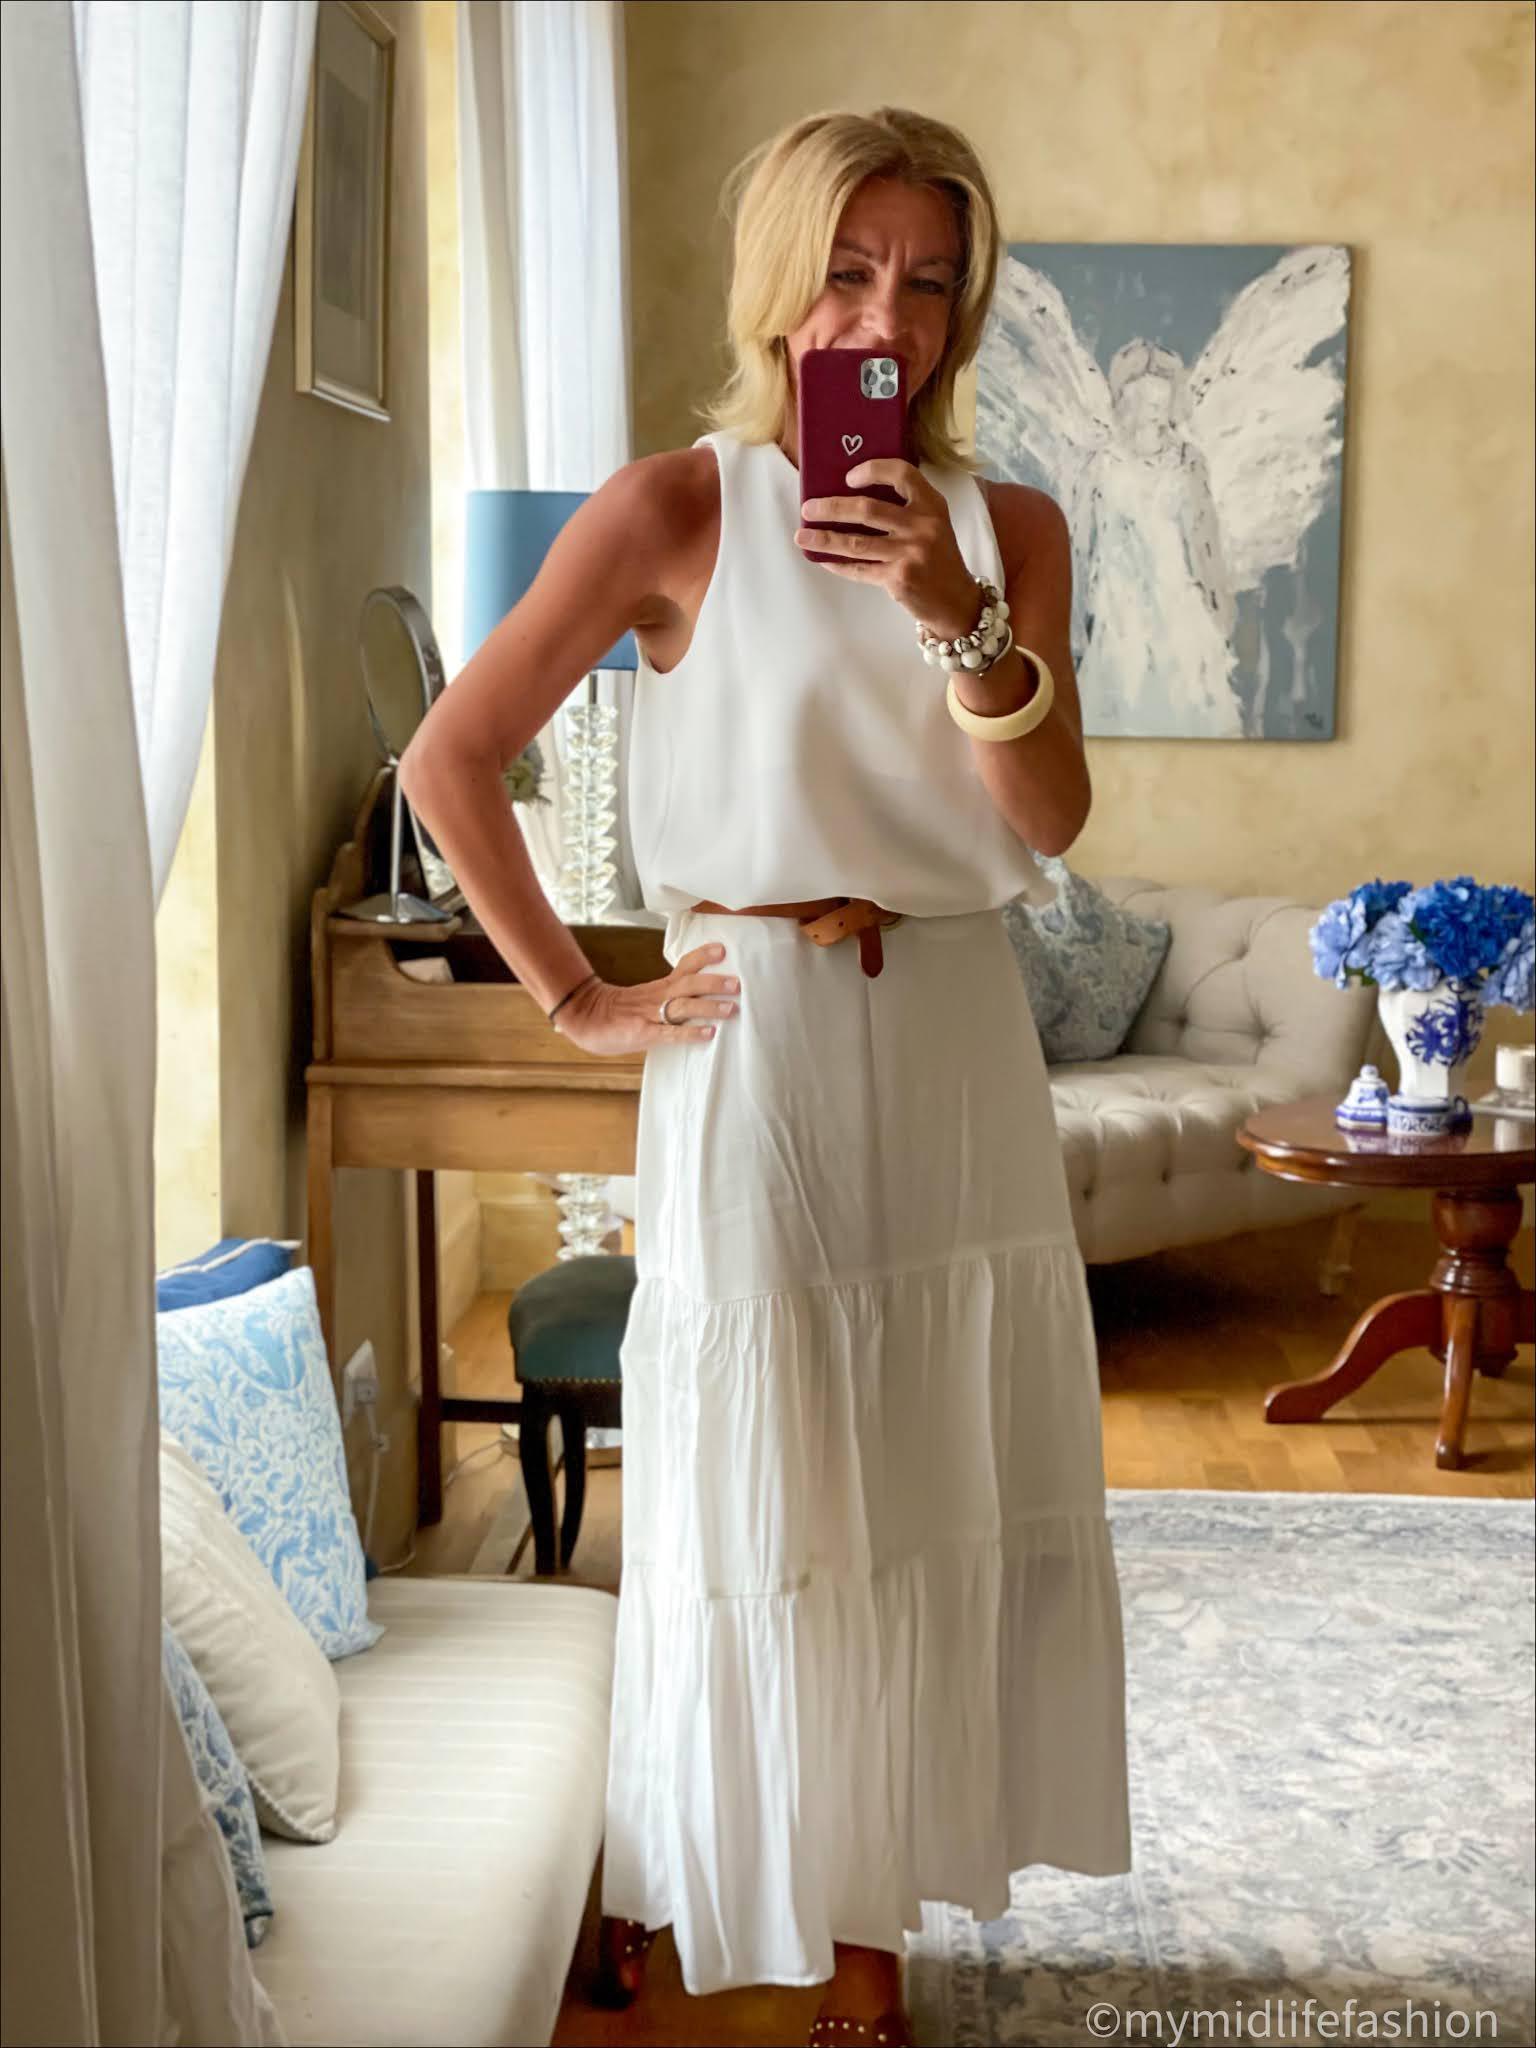 my midlife fashion, phase eight aspenne skirt, Zara tank top, Massimo Dutti leather belt, basalt studded sliders